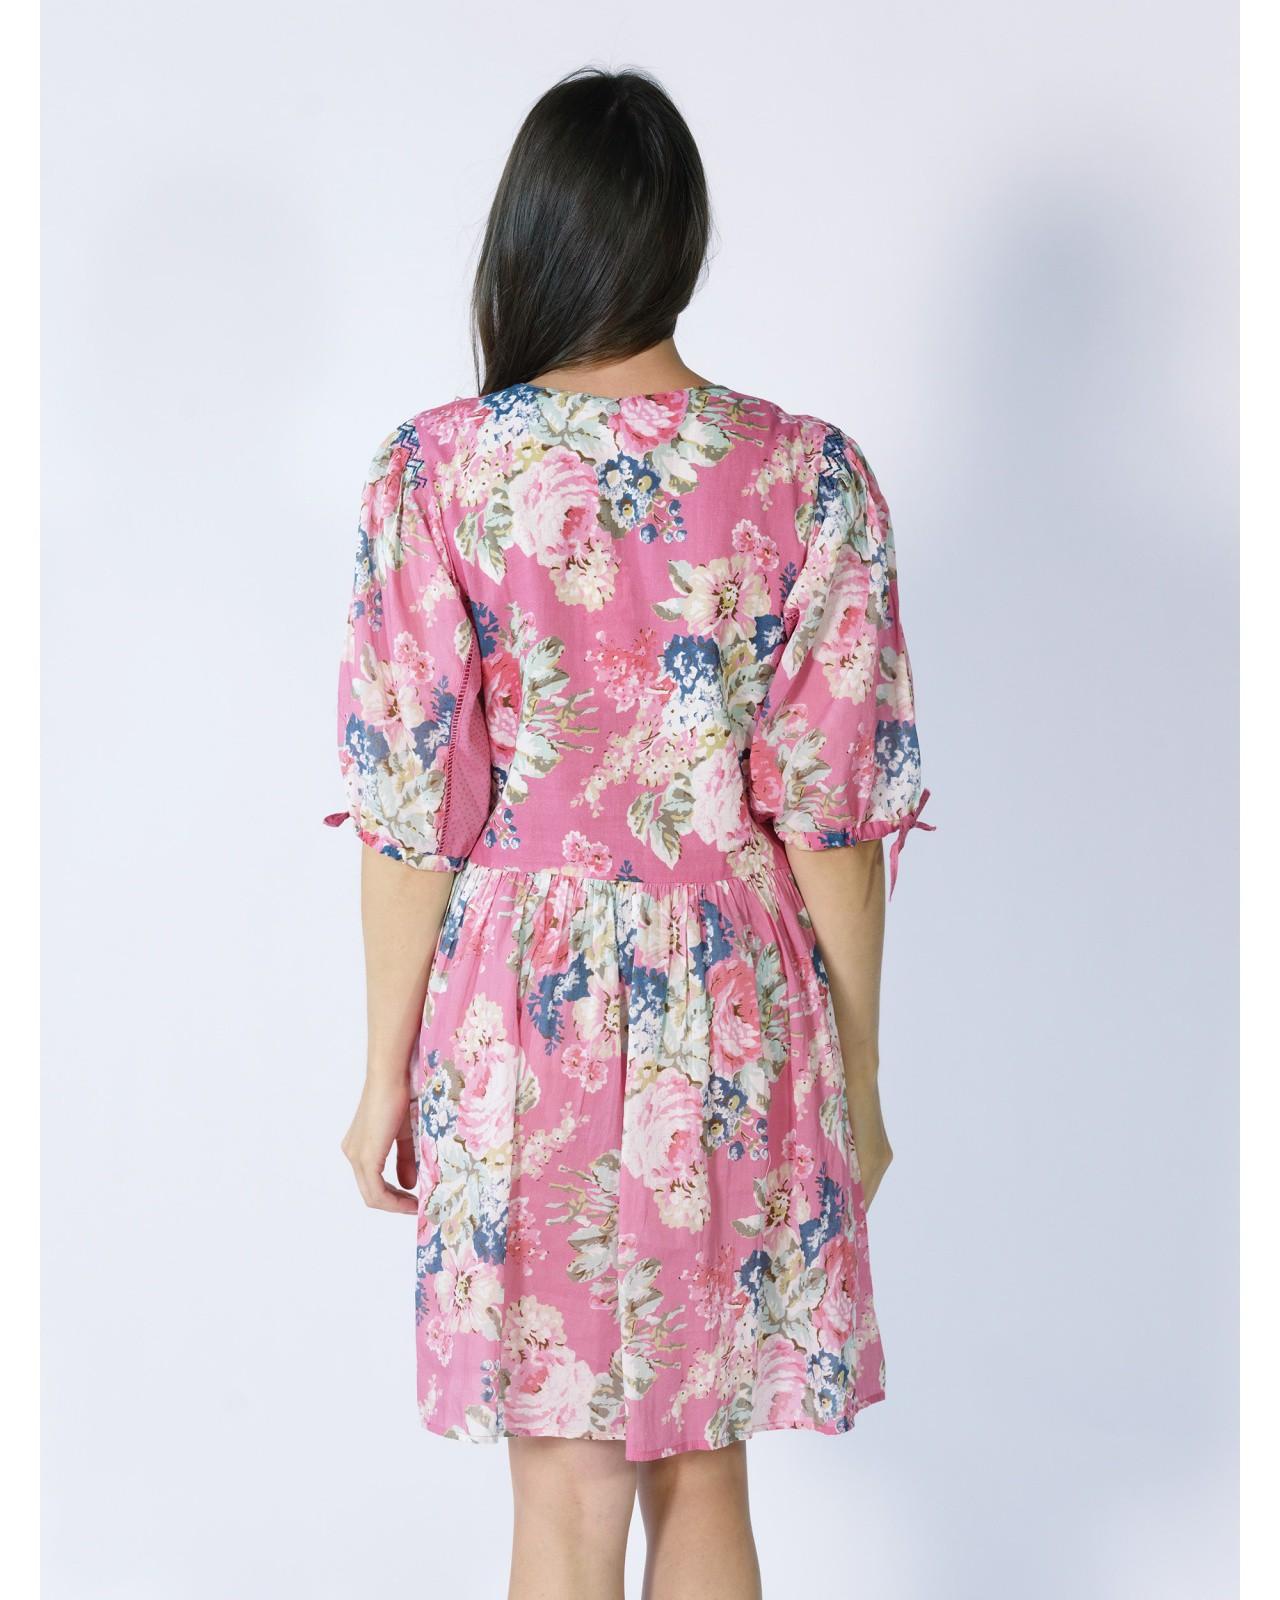 Robe rose fleurie Rhum Raisin, Valensole 69